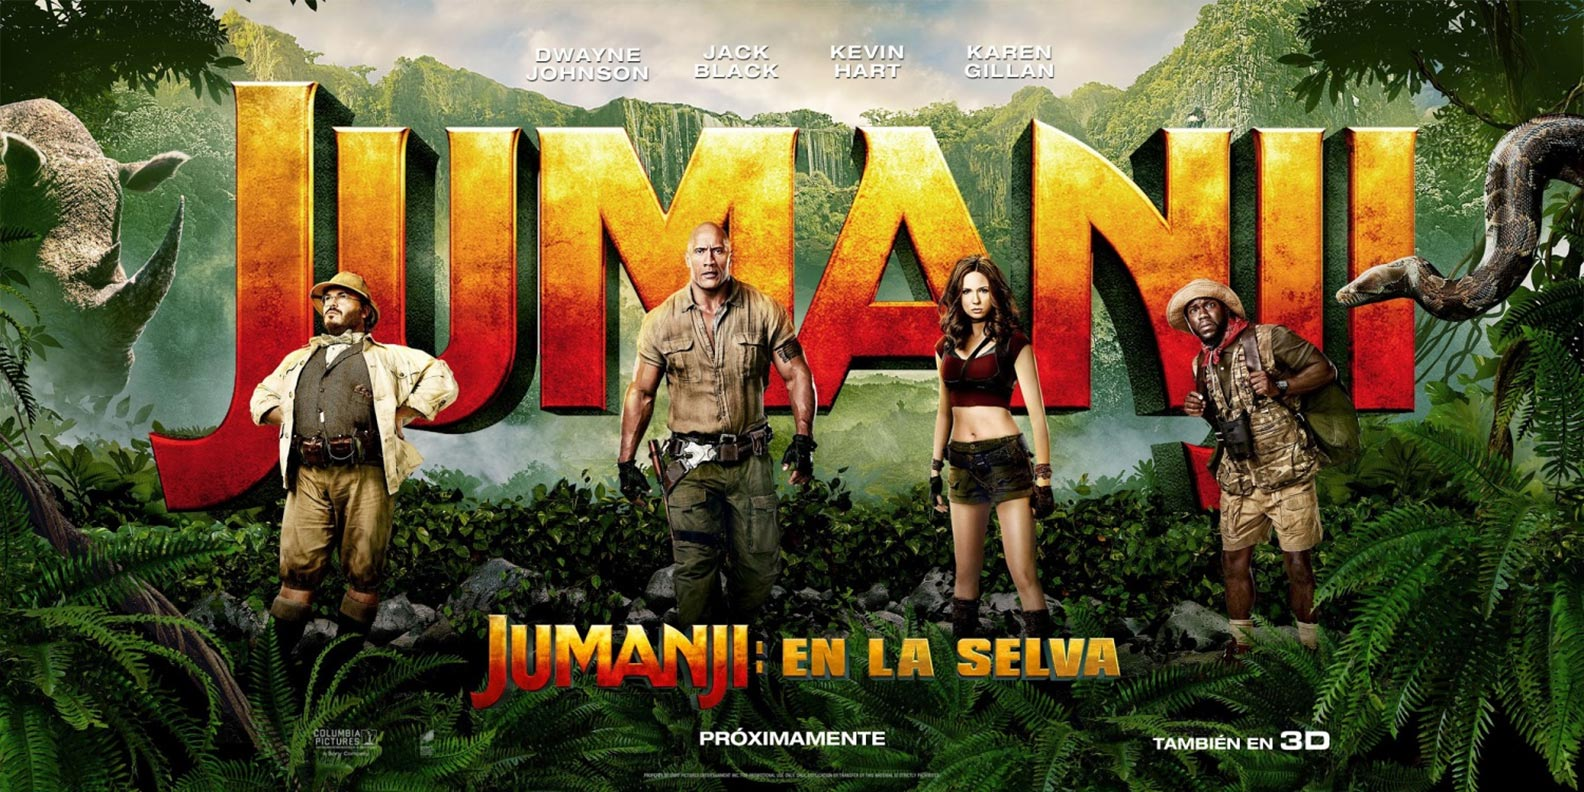 Jumanji 2: Welcome to the Jungle 2017 English BluRay 480p 720p 1080p